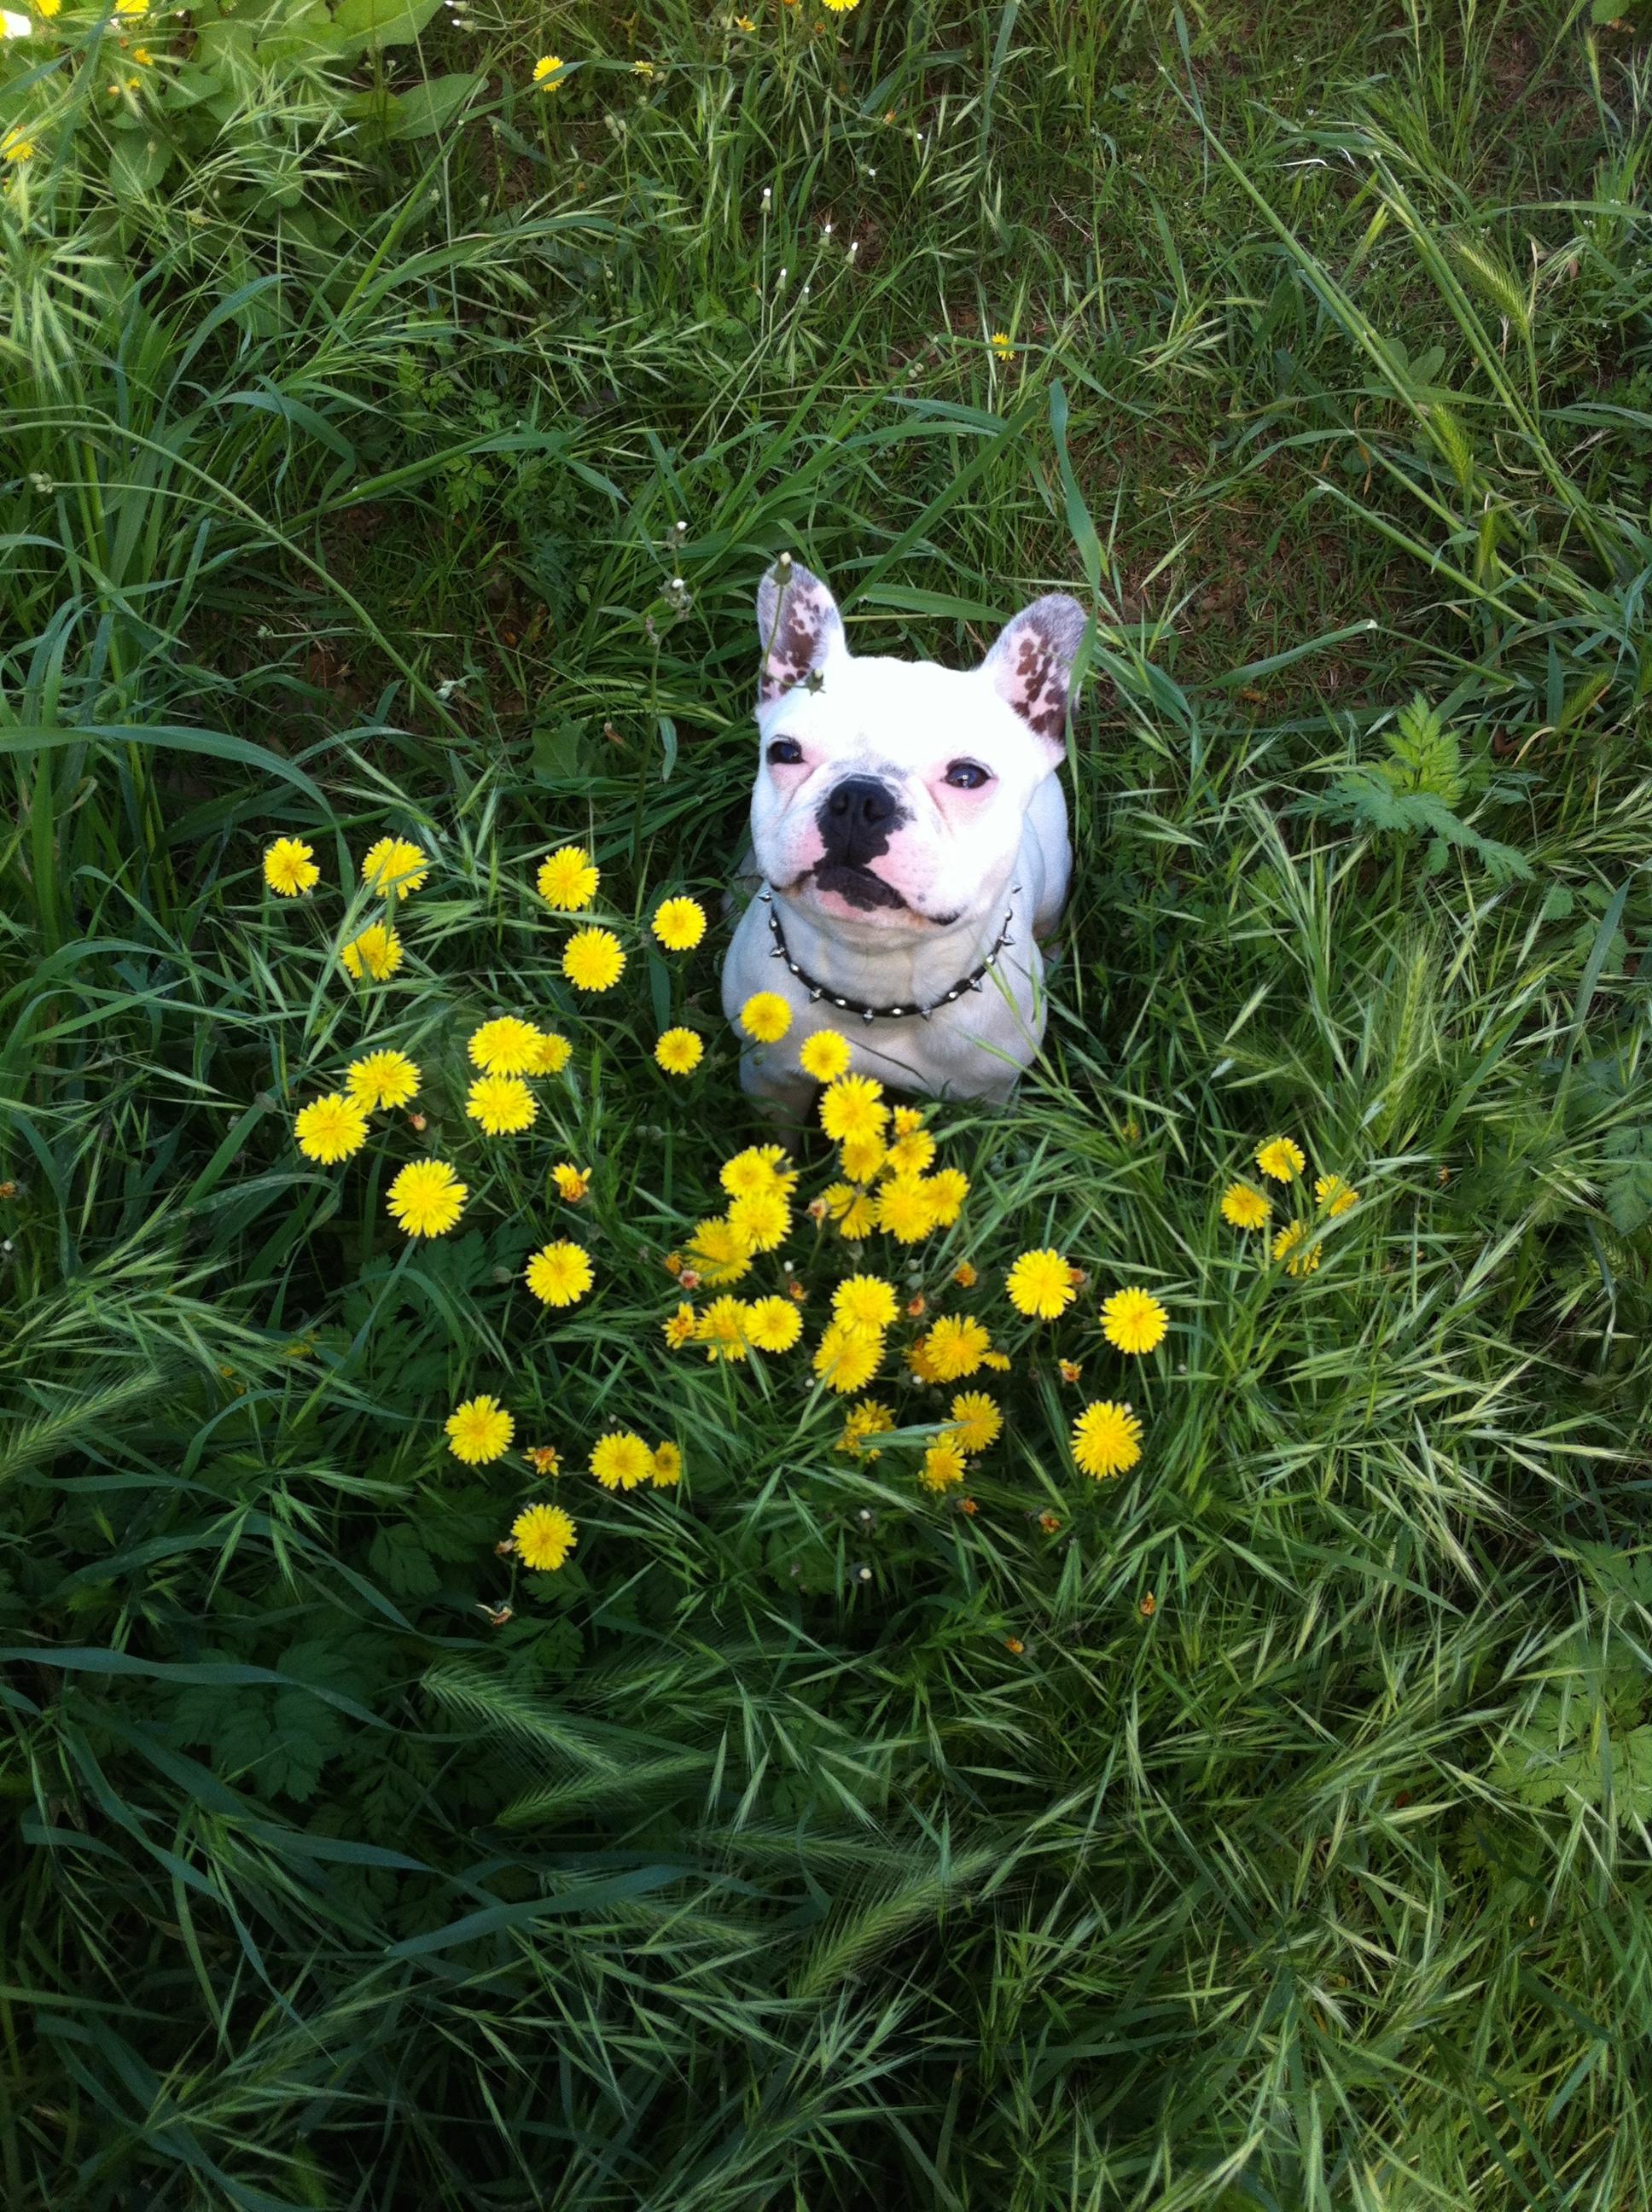 Perri in the grass